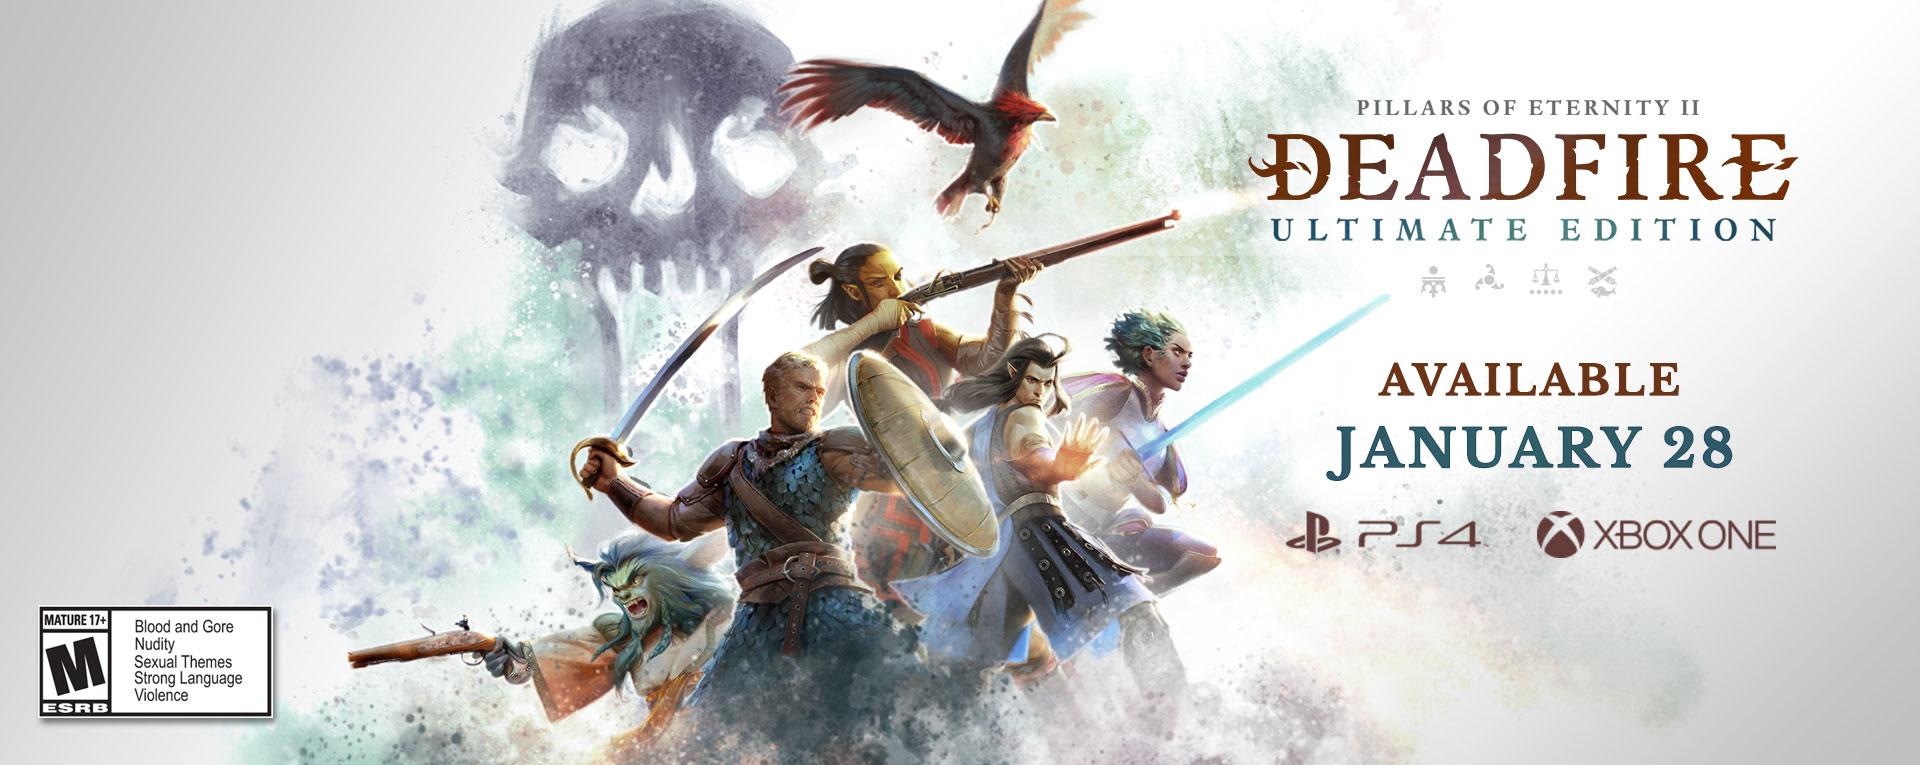 Pillars of Eternity II: Deadfire Console Patch Now Live